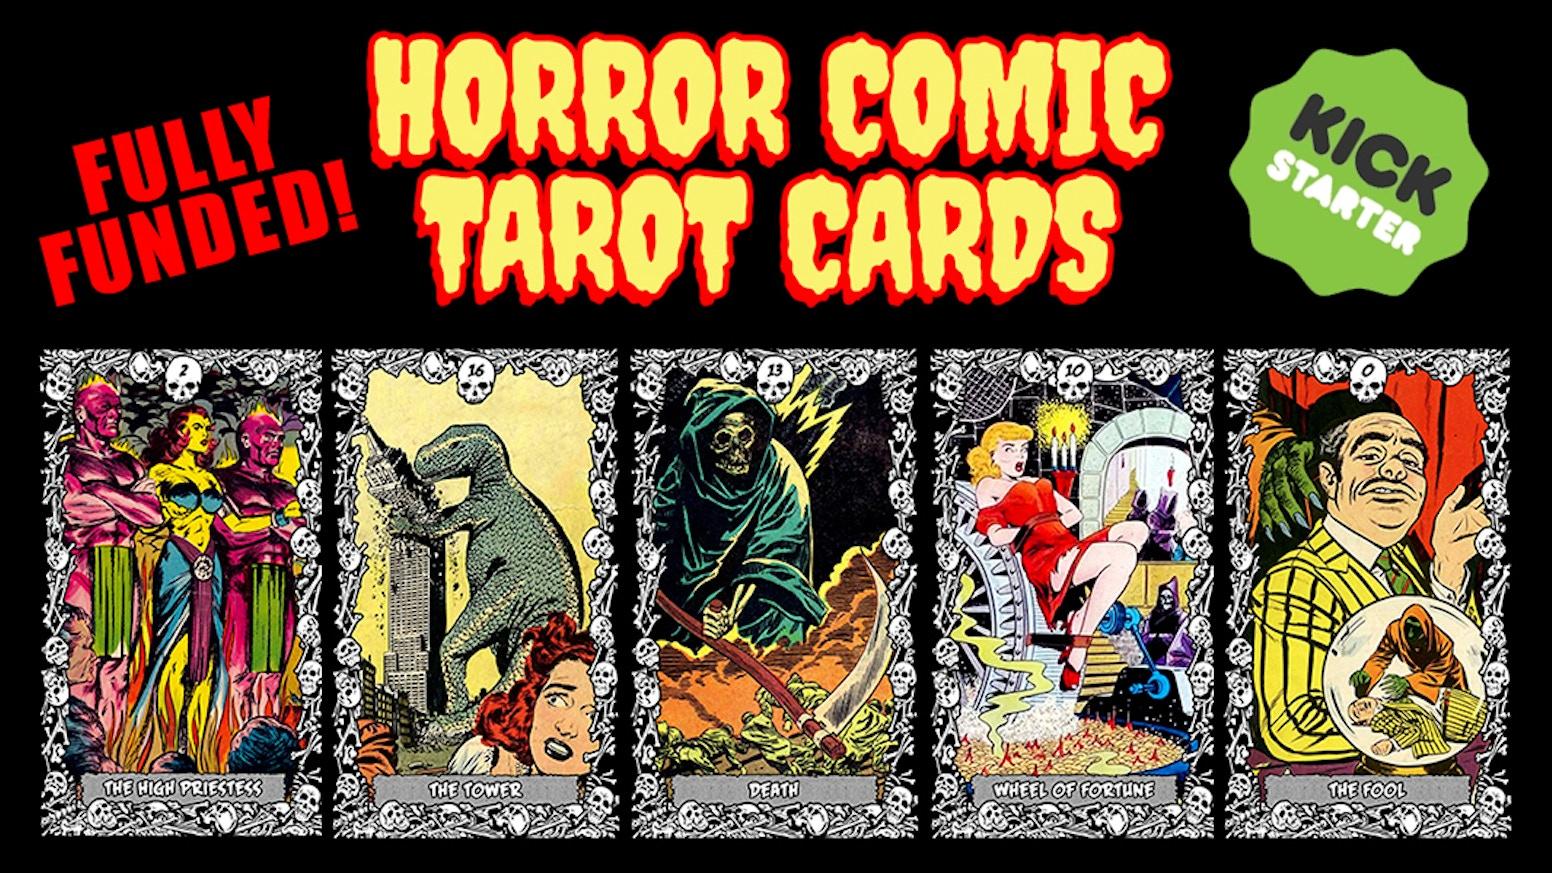 Horror Comic Tarot Cards by Chris